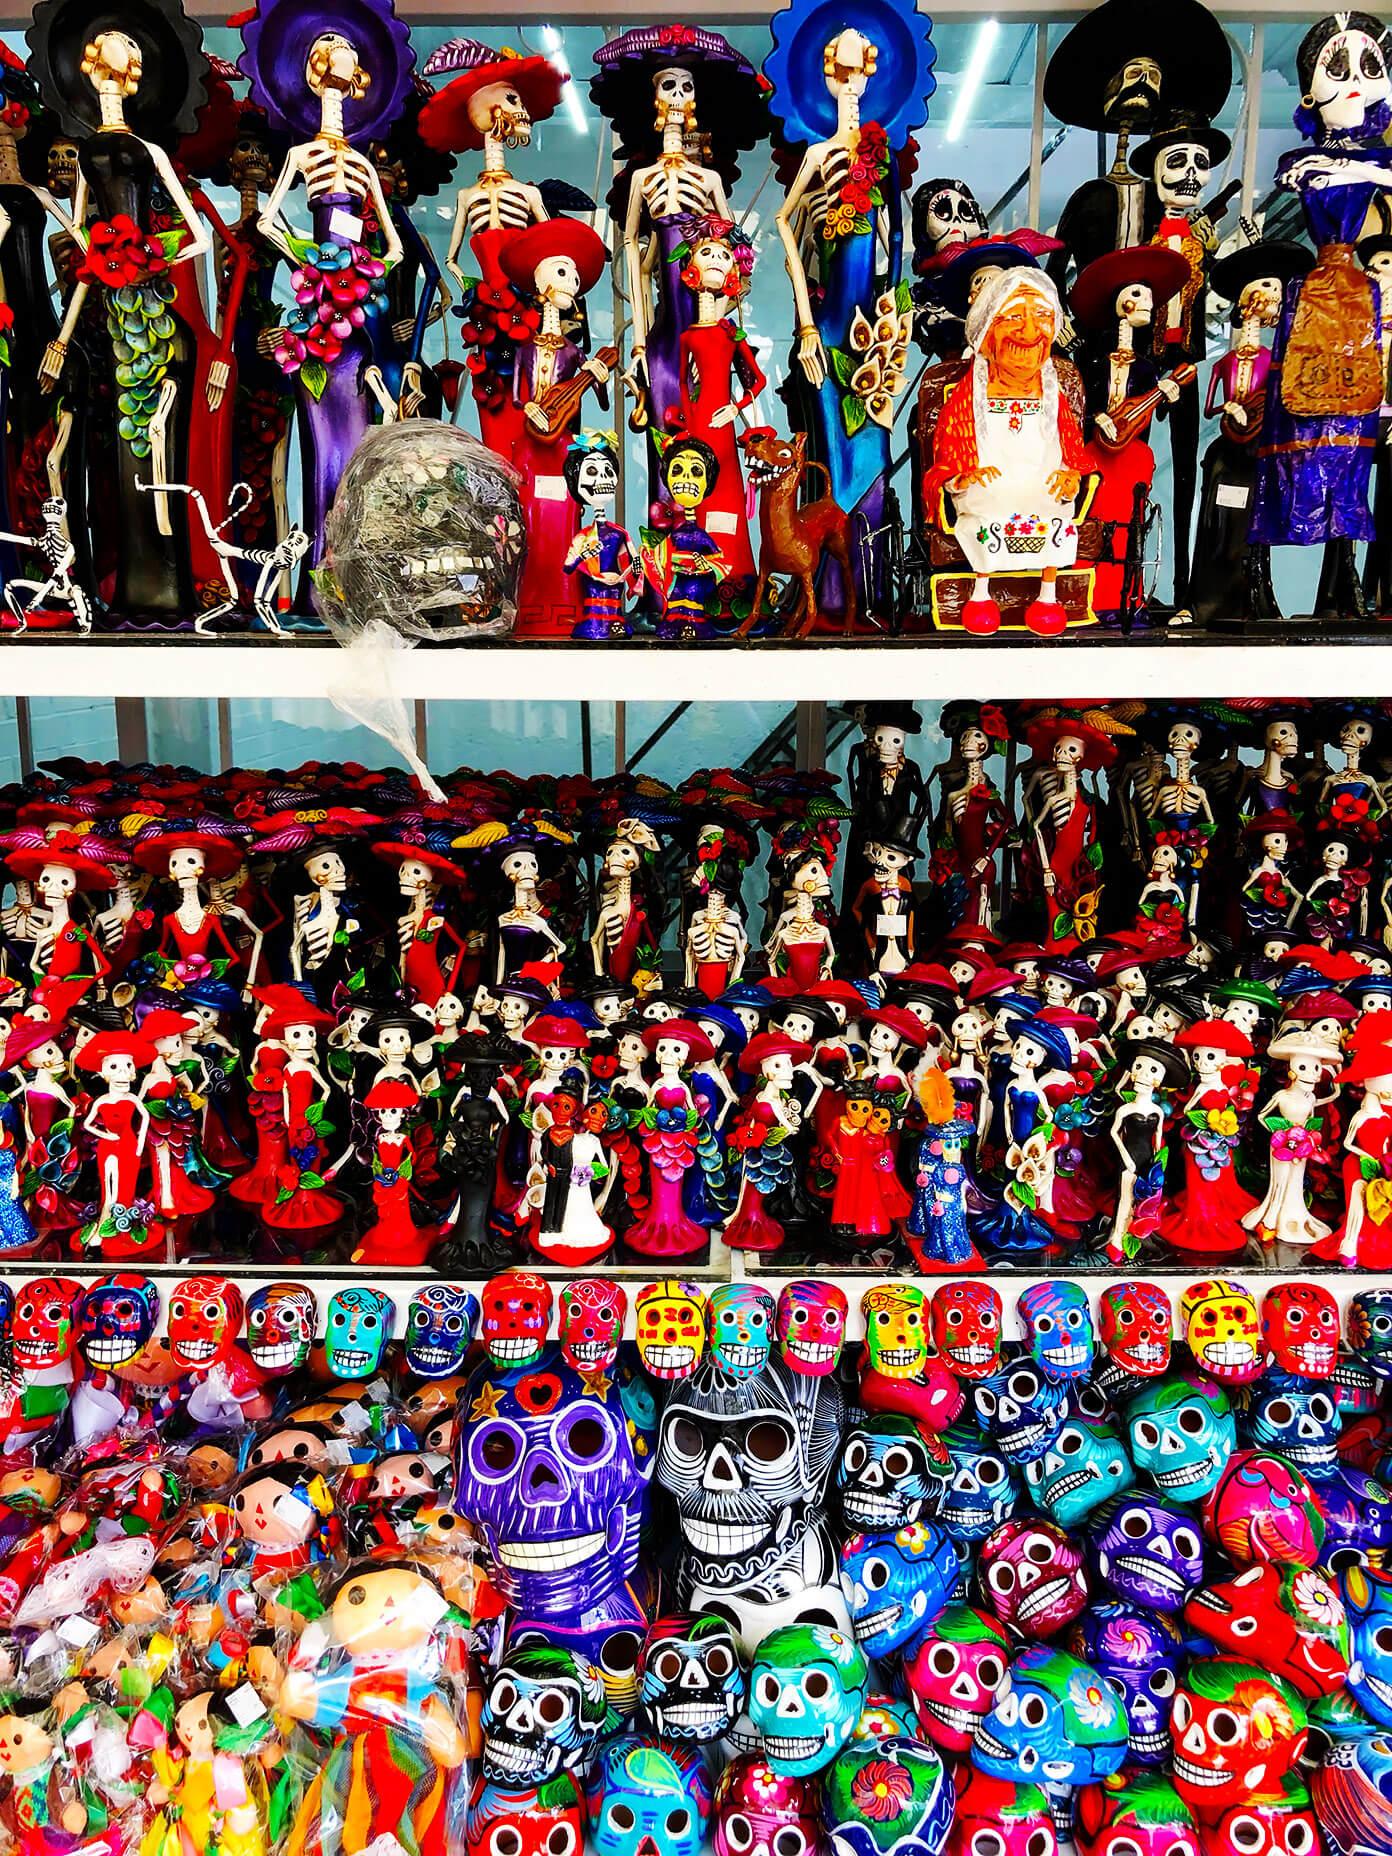 Mexico City Souvenirs